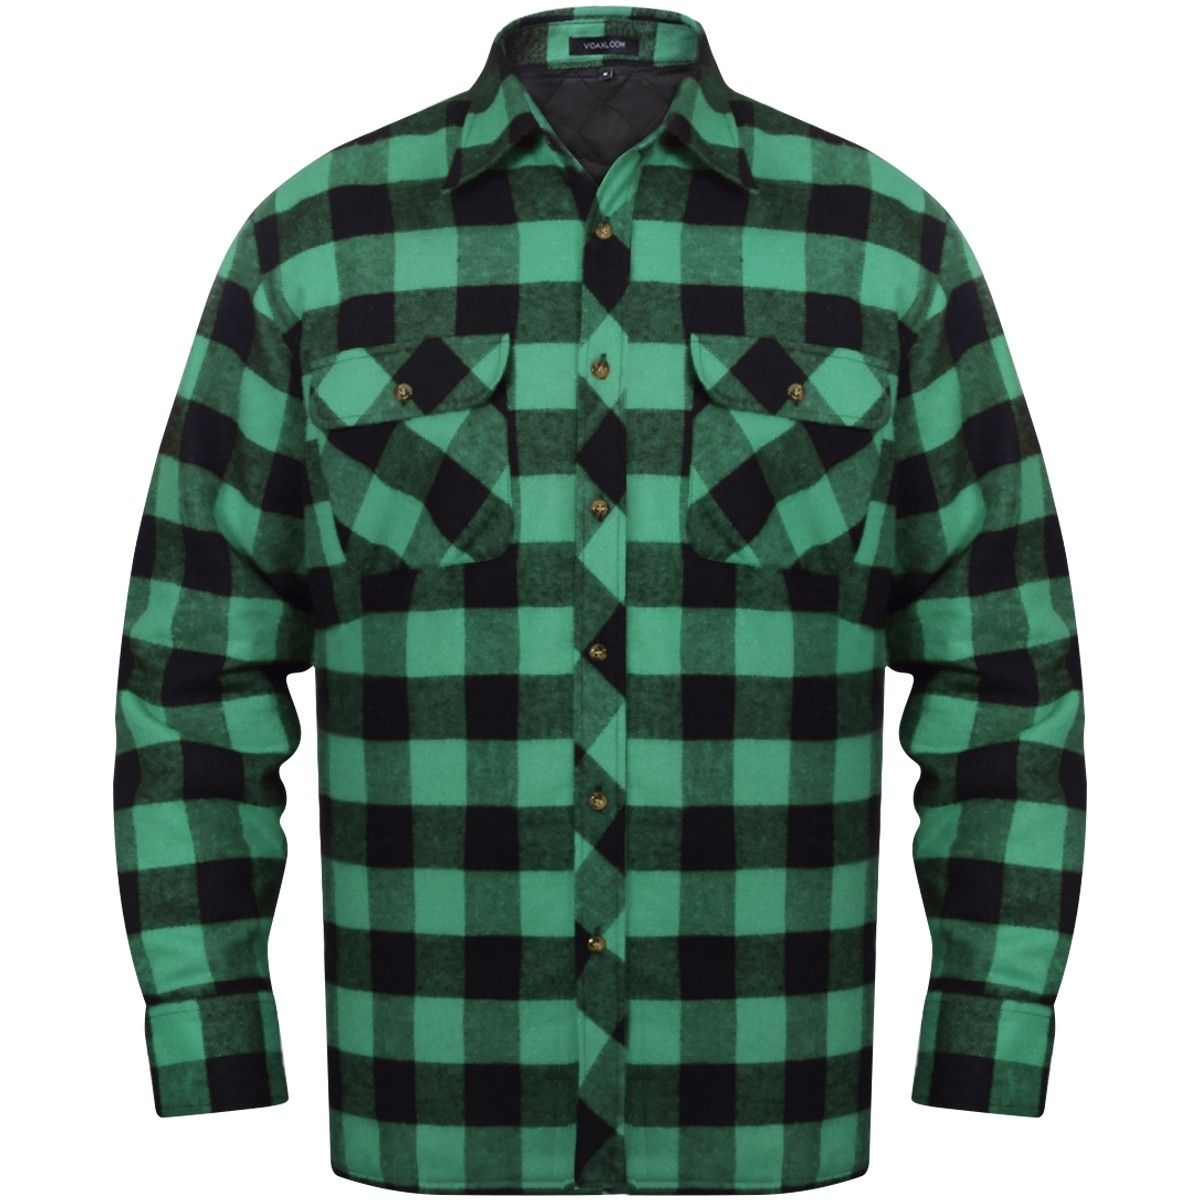 0f042d6d Herre polstret, rutete flanellskjorter, grønn/svart L (131001) | FINN.no